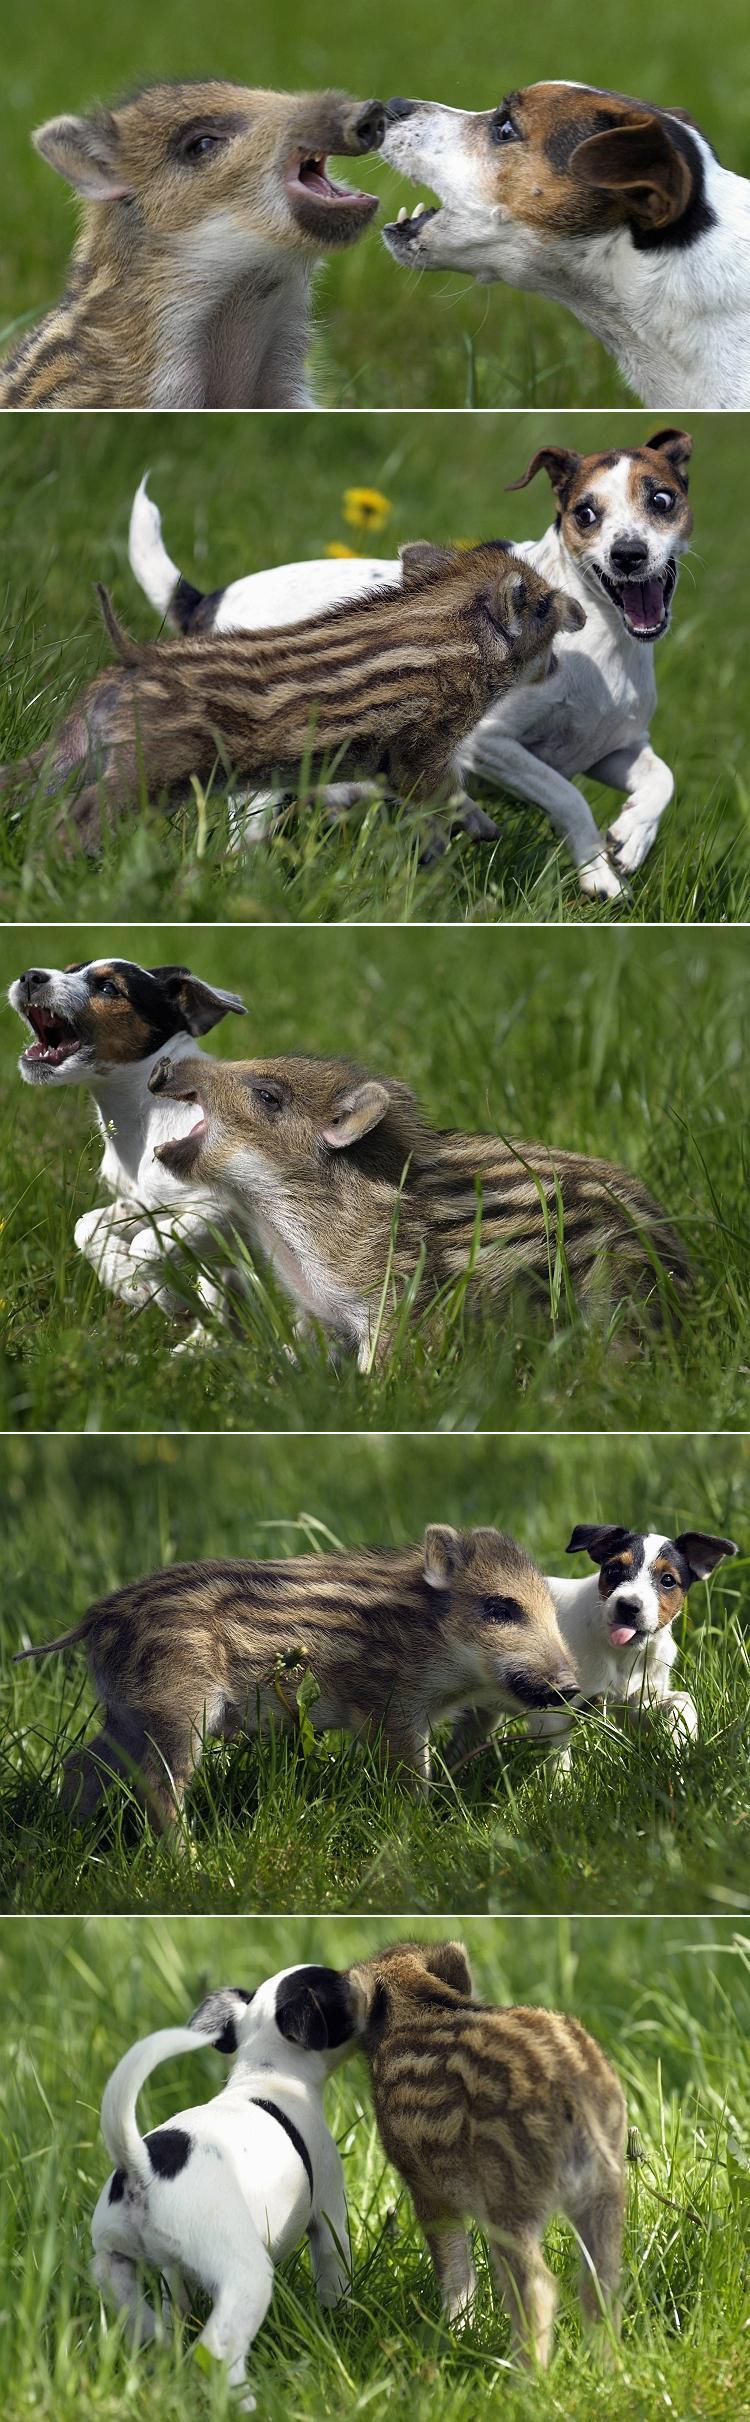 amizade entre cachorro e javali